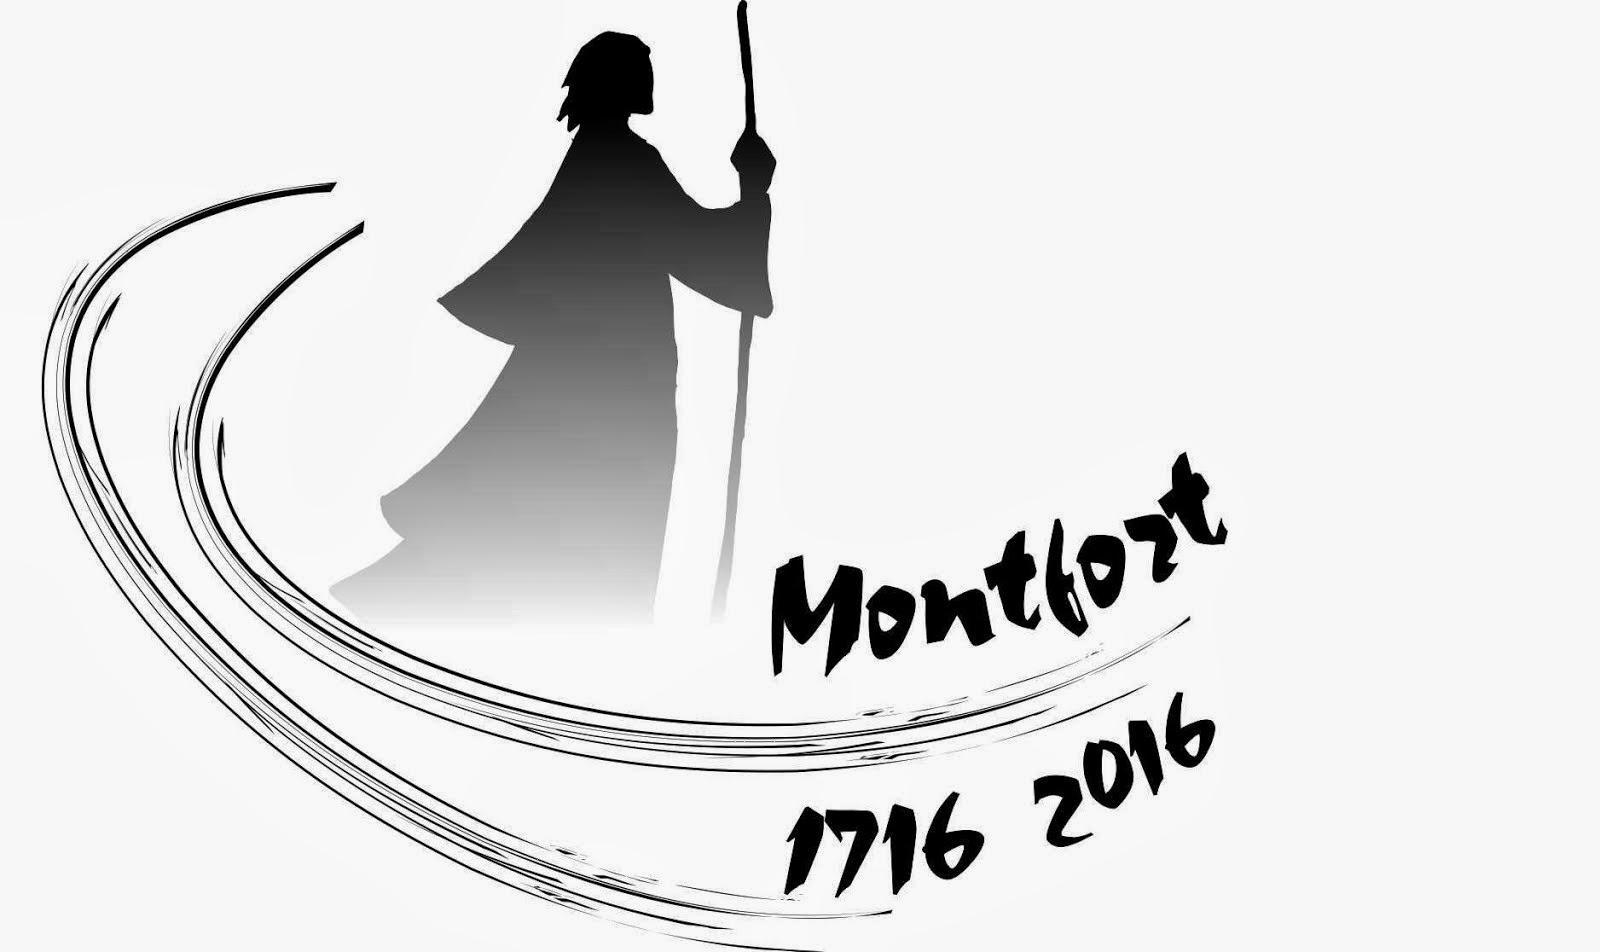 Tricentenaire de la mort de Montfort